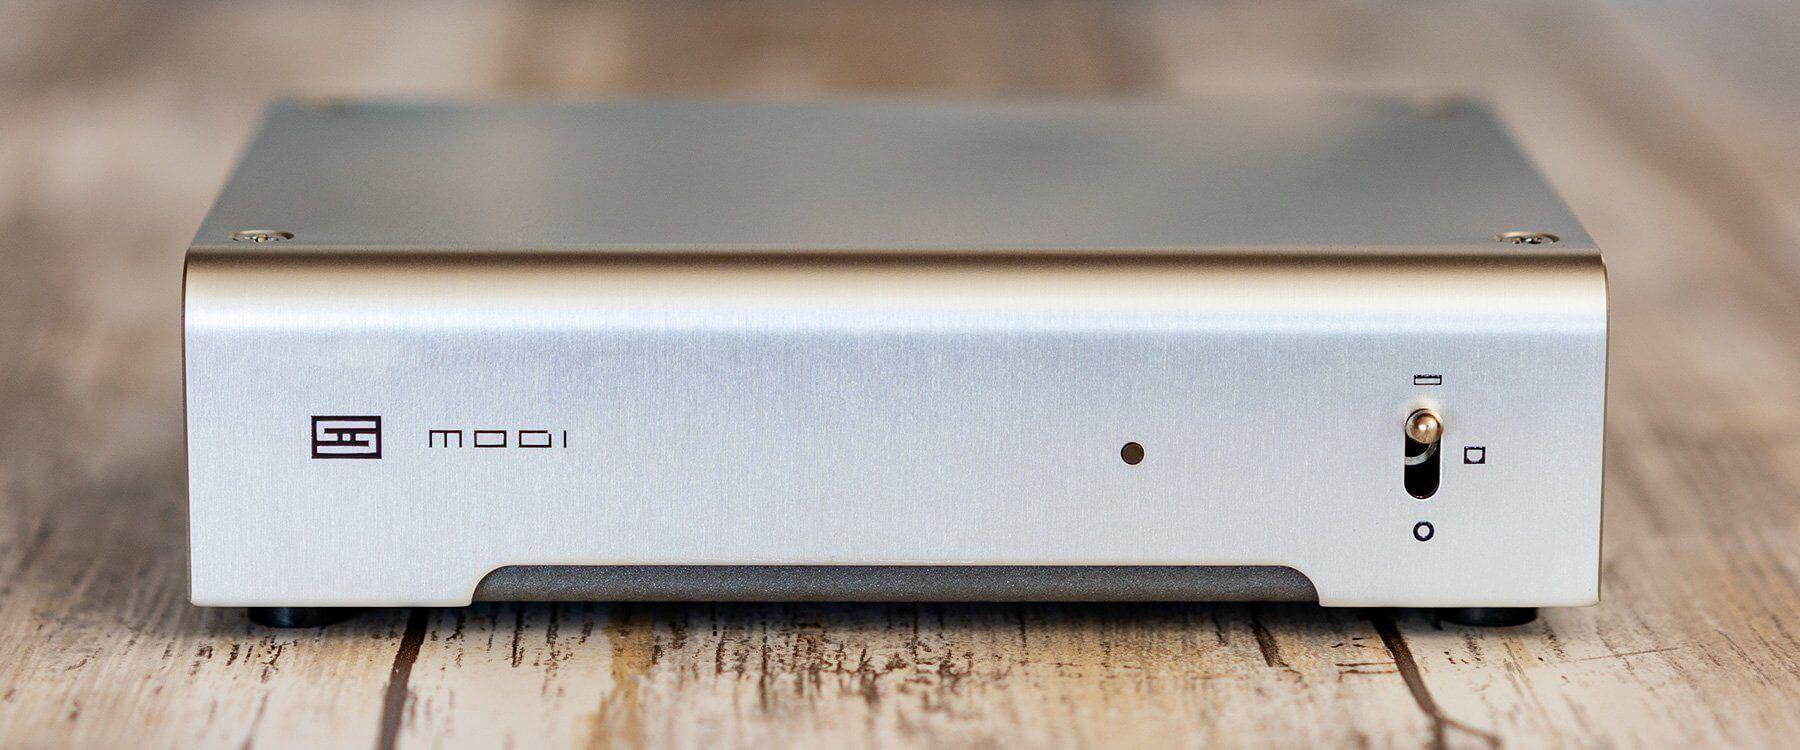 Schiit Audio Modi 3 - Desktop DAC - Review